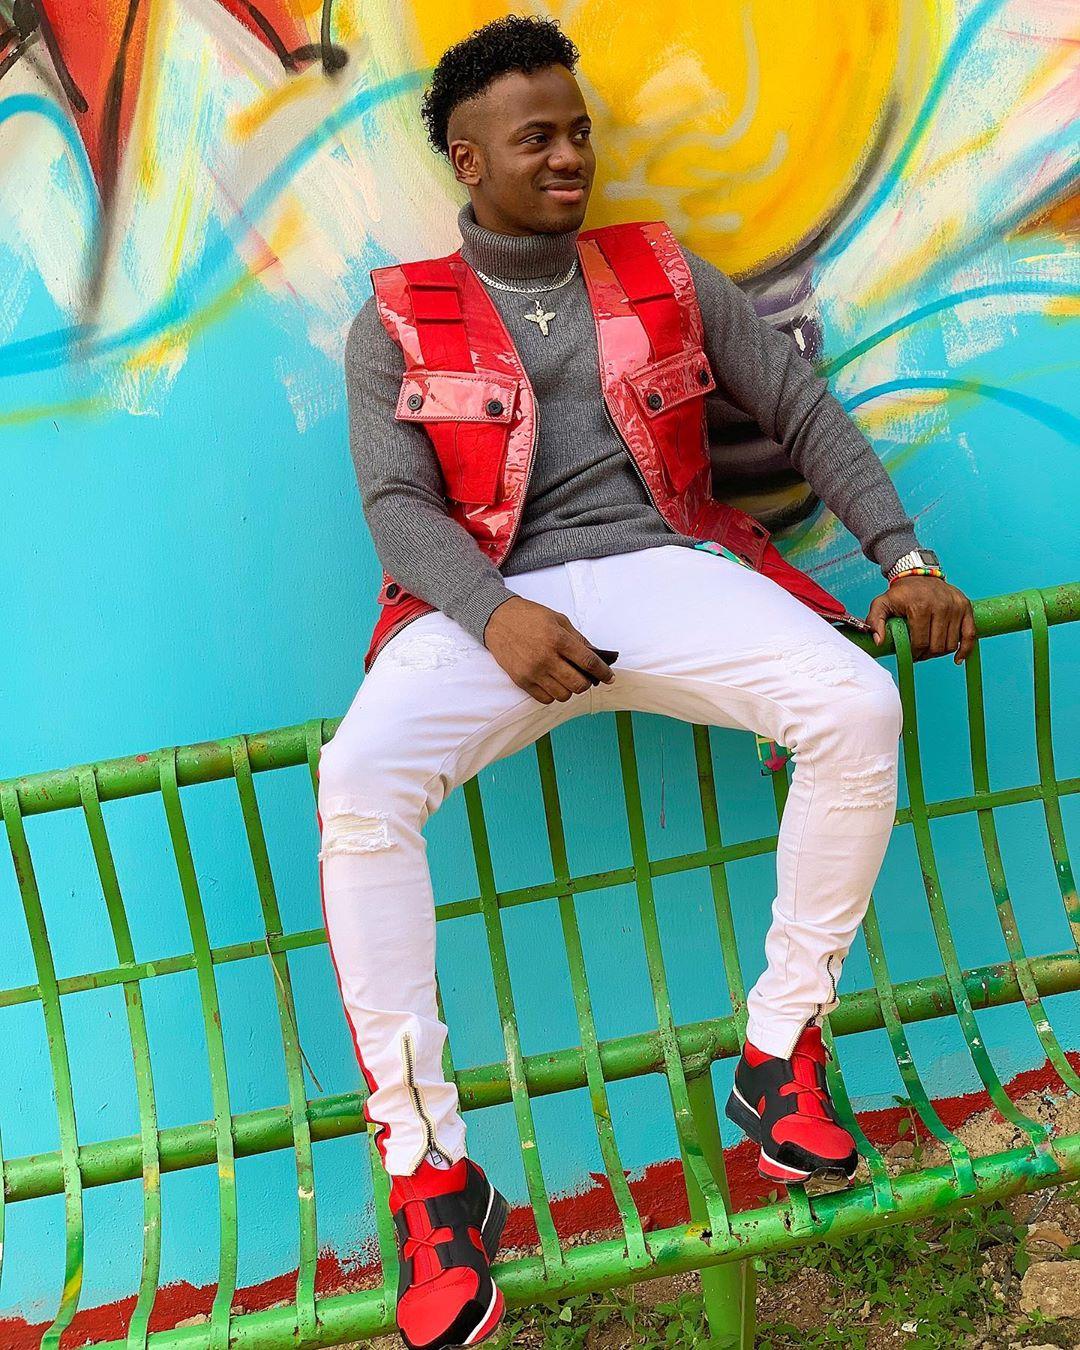 korede-bello-Nigerian-male-celebrities-style